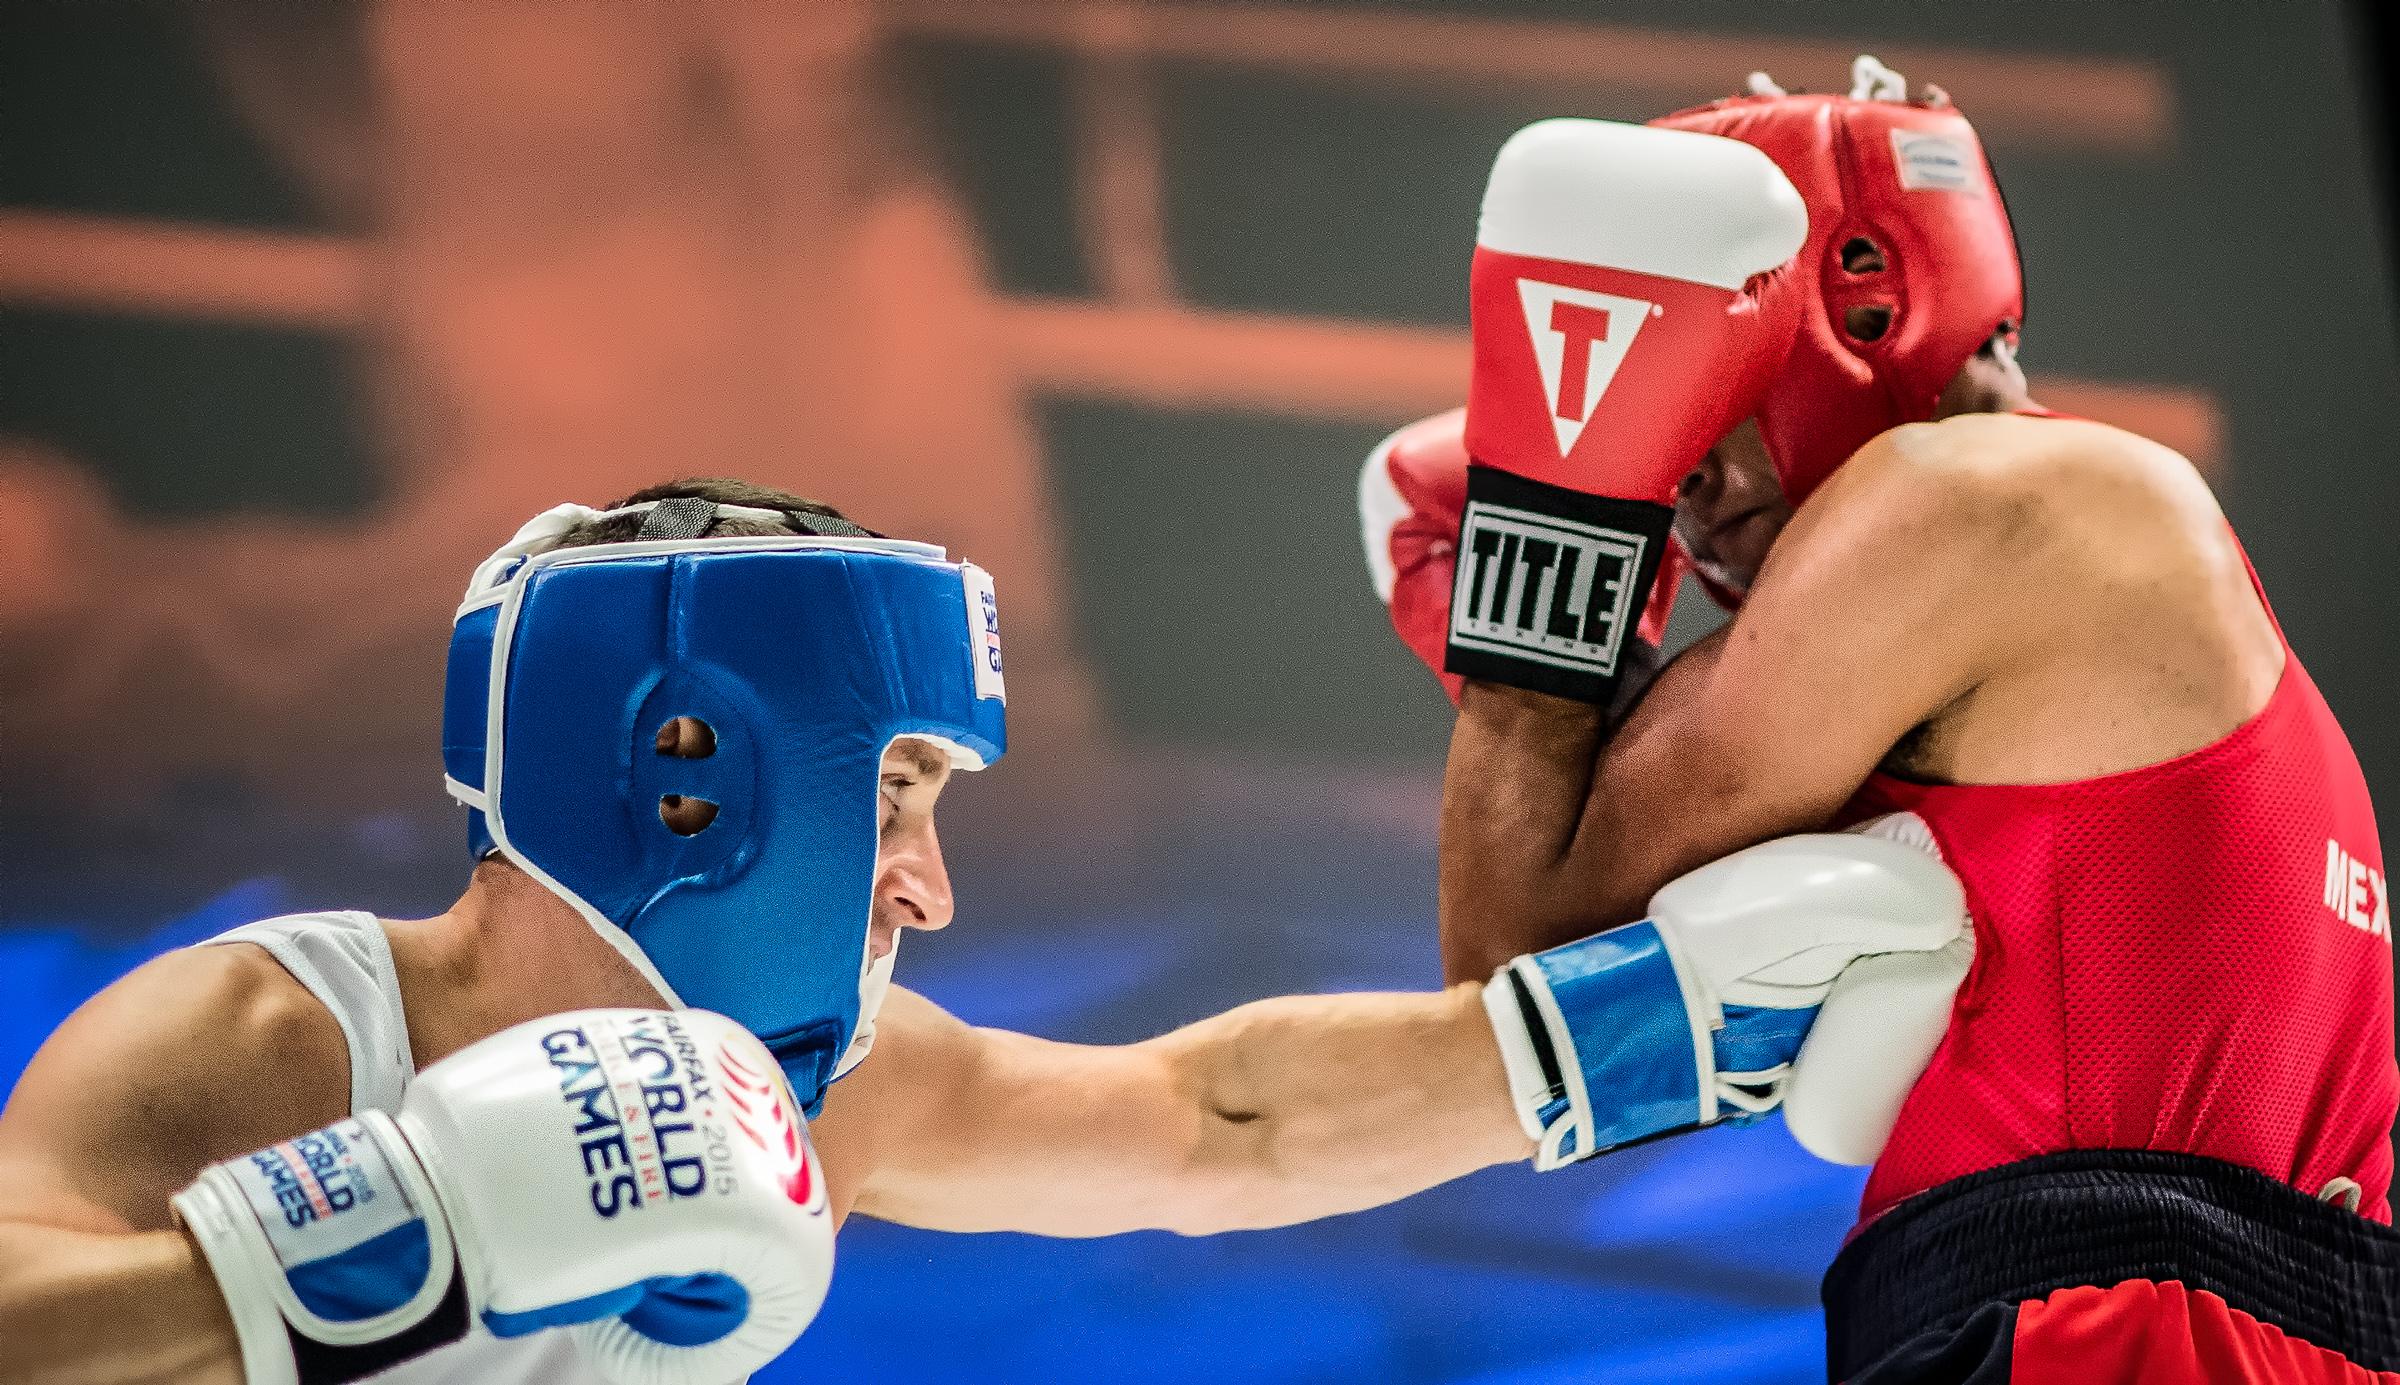 TR_boxing-1.jpg